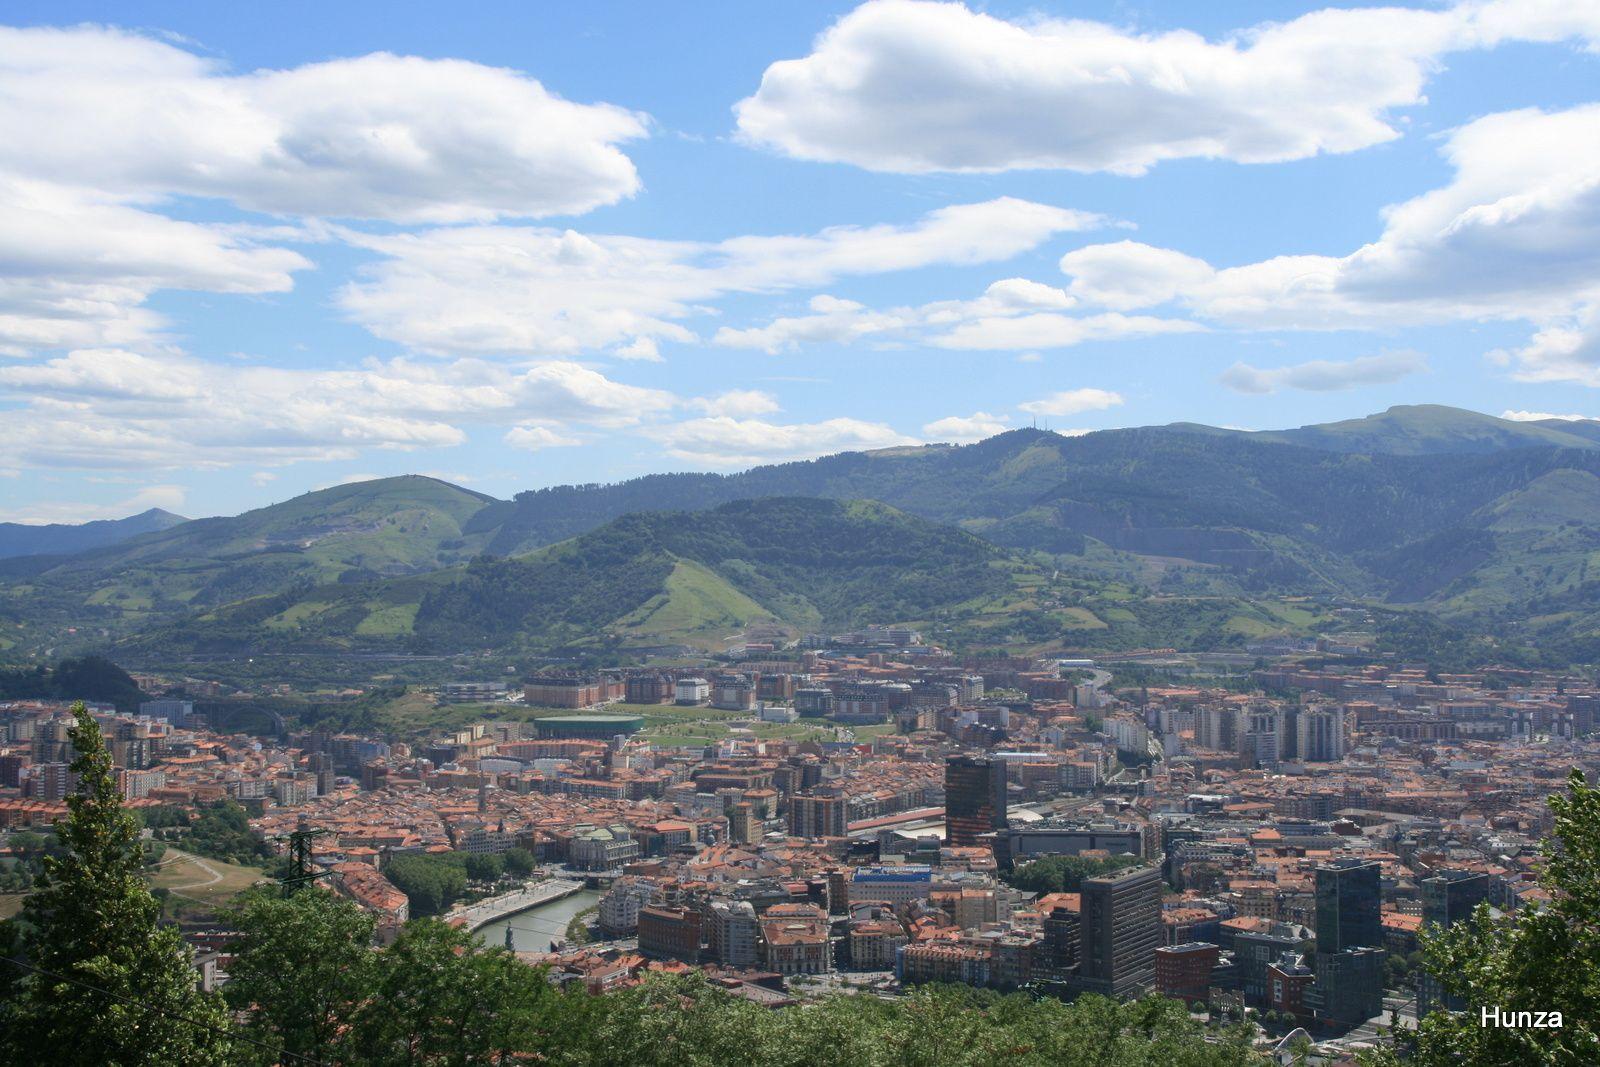 Panorama sur Bilbao depuis le monte Arxanda